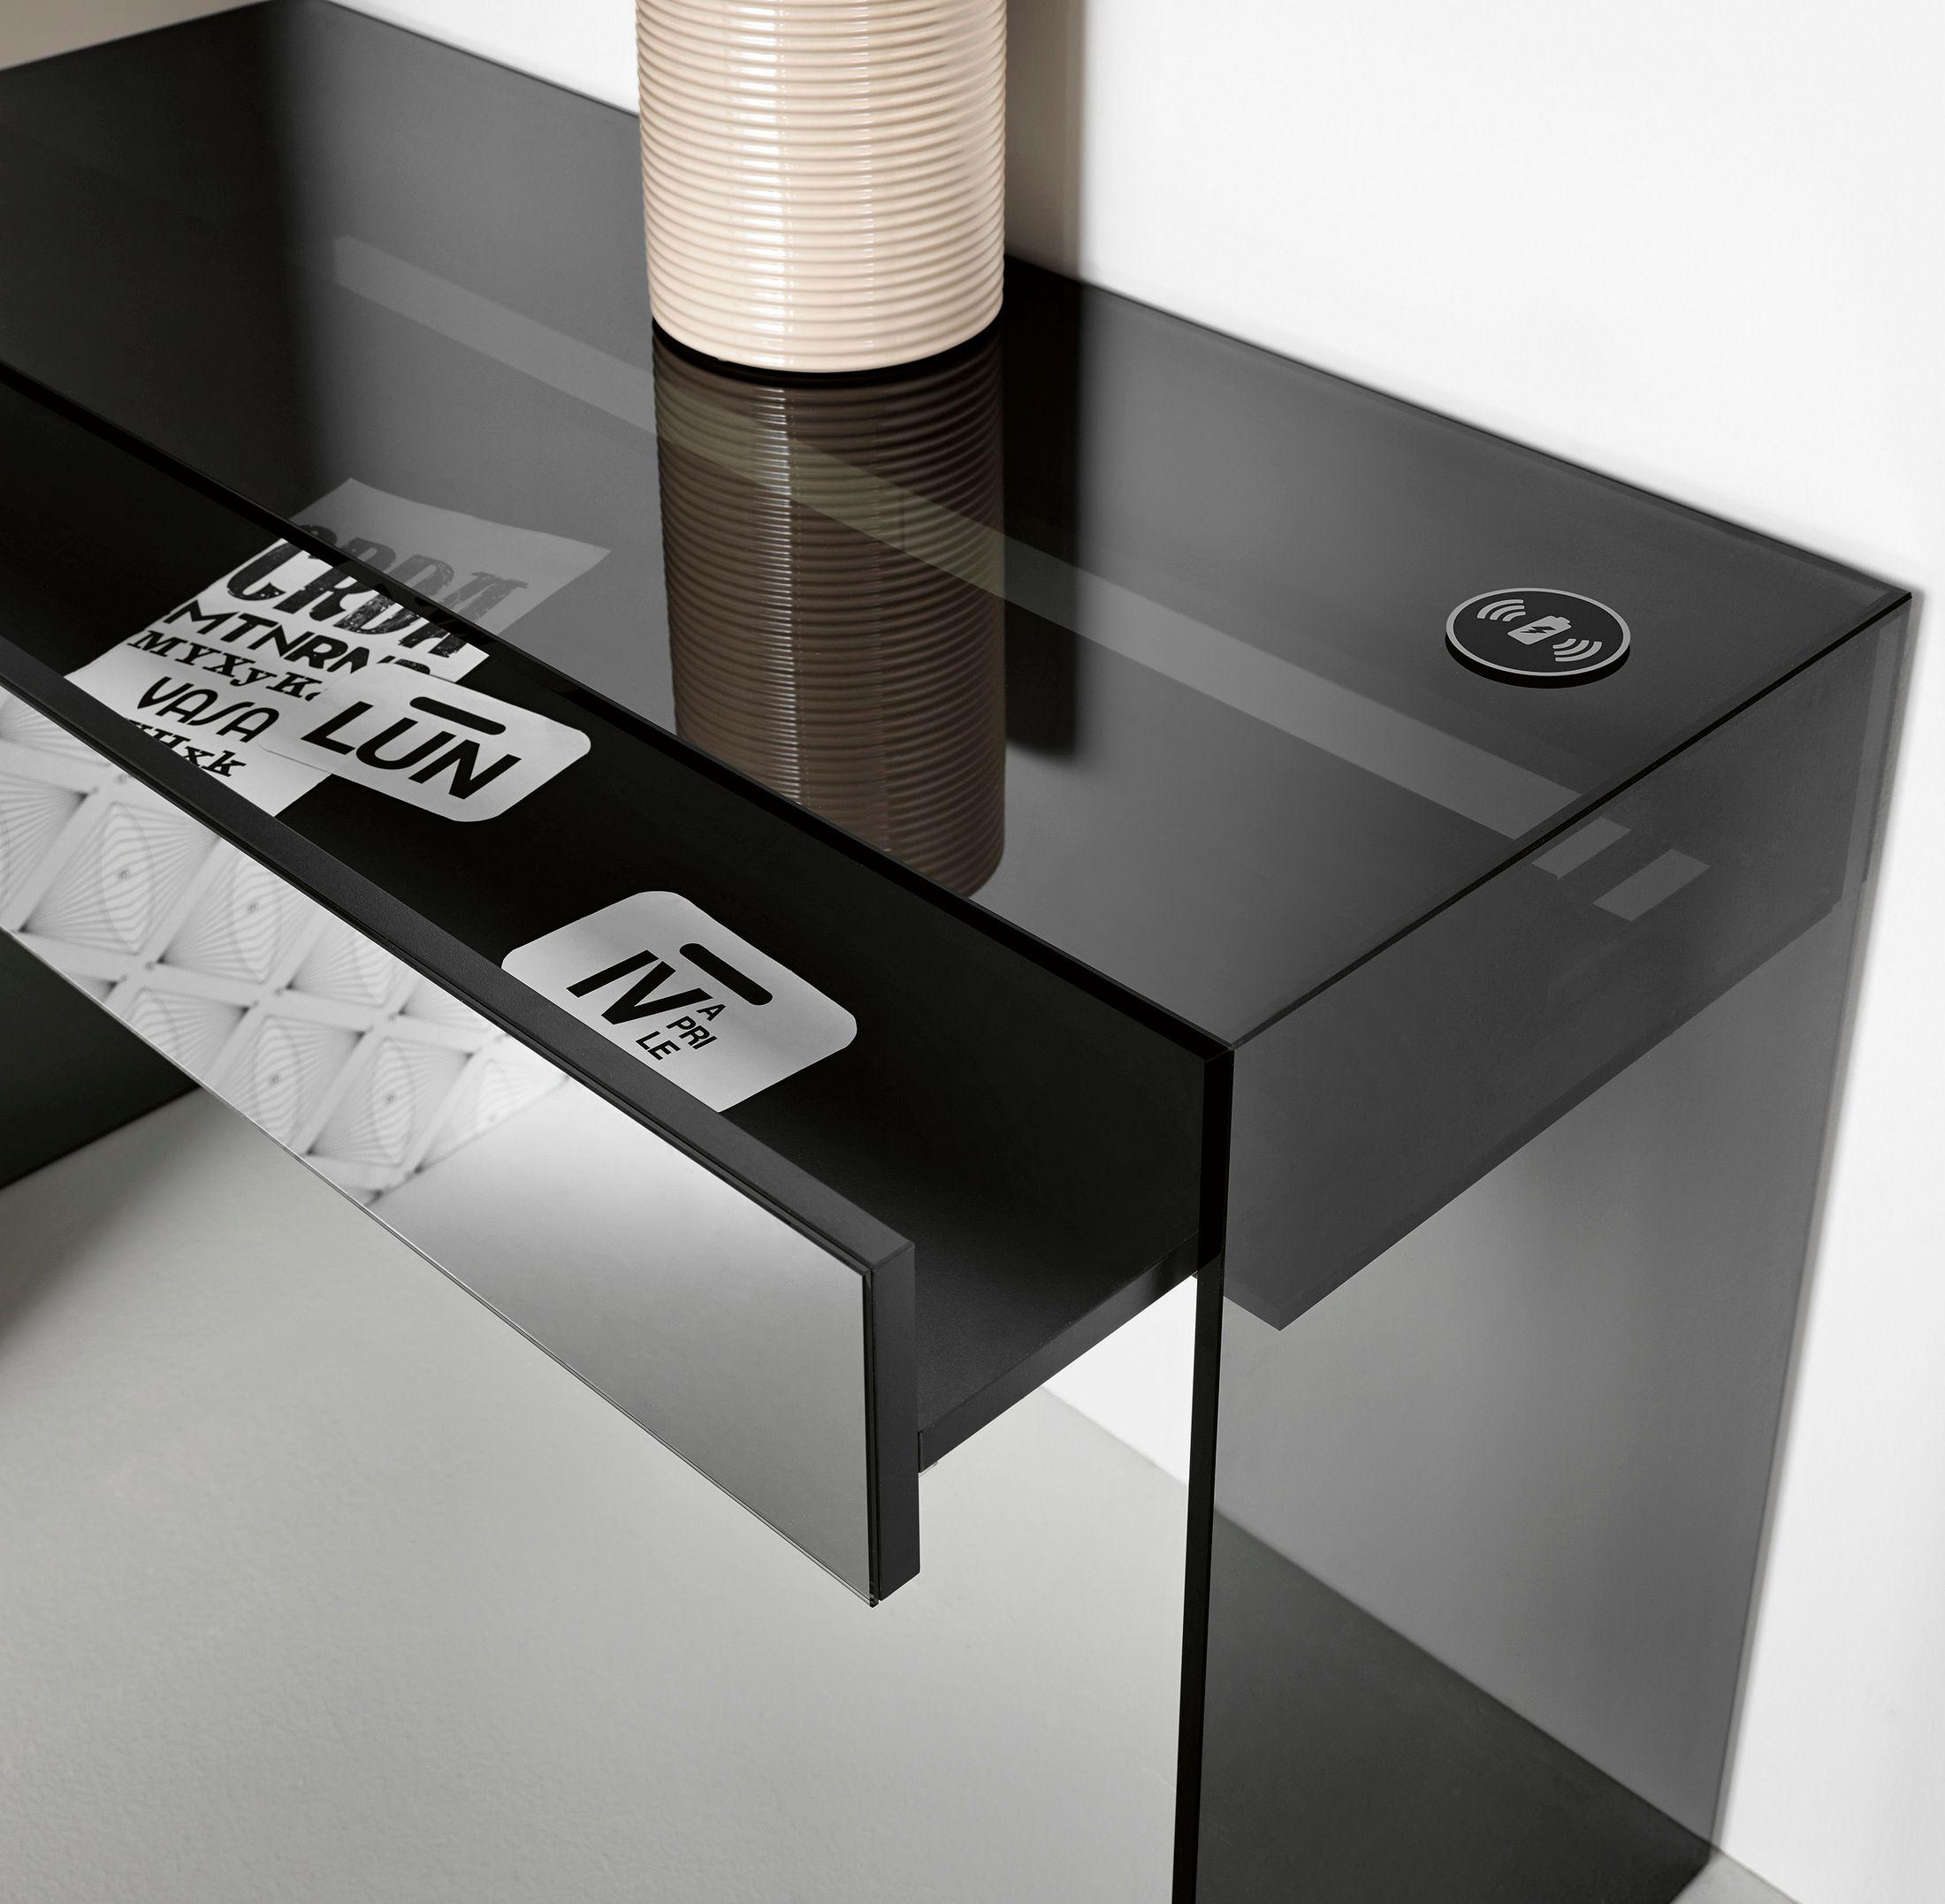 gotham konsolentisch by t d tonelli design design niko. Black Bedroom Furniture Sets. Home Design Ideas